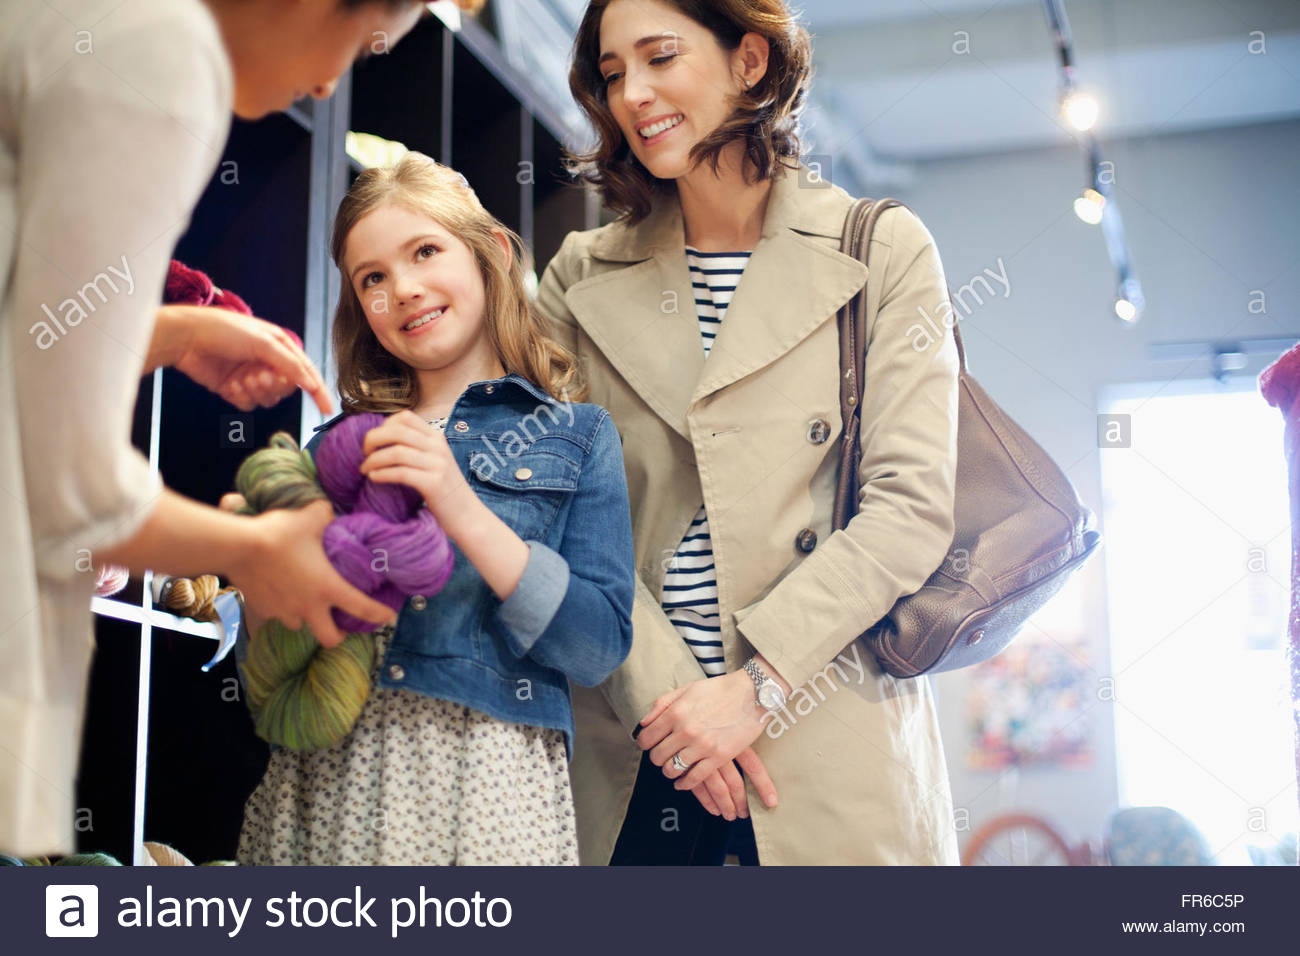 shop owner advising on yarn choice Stock Photo